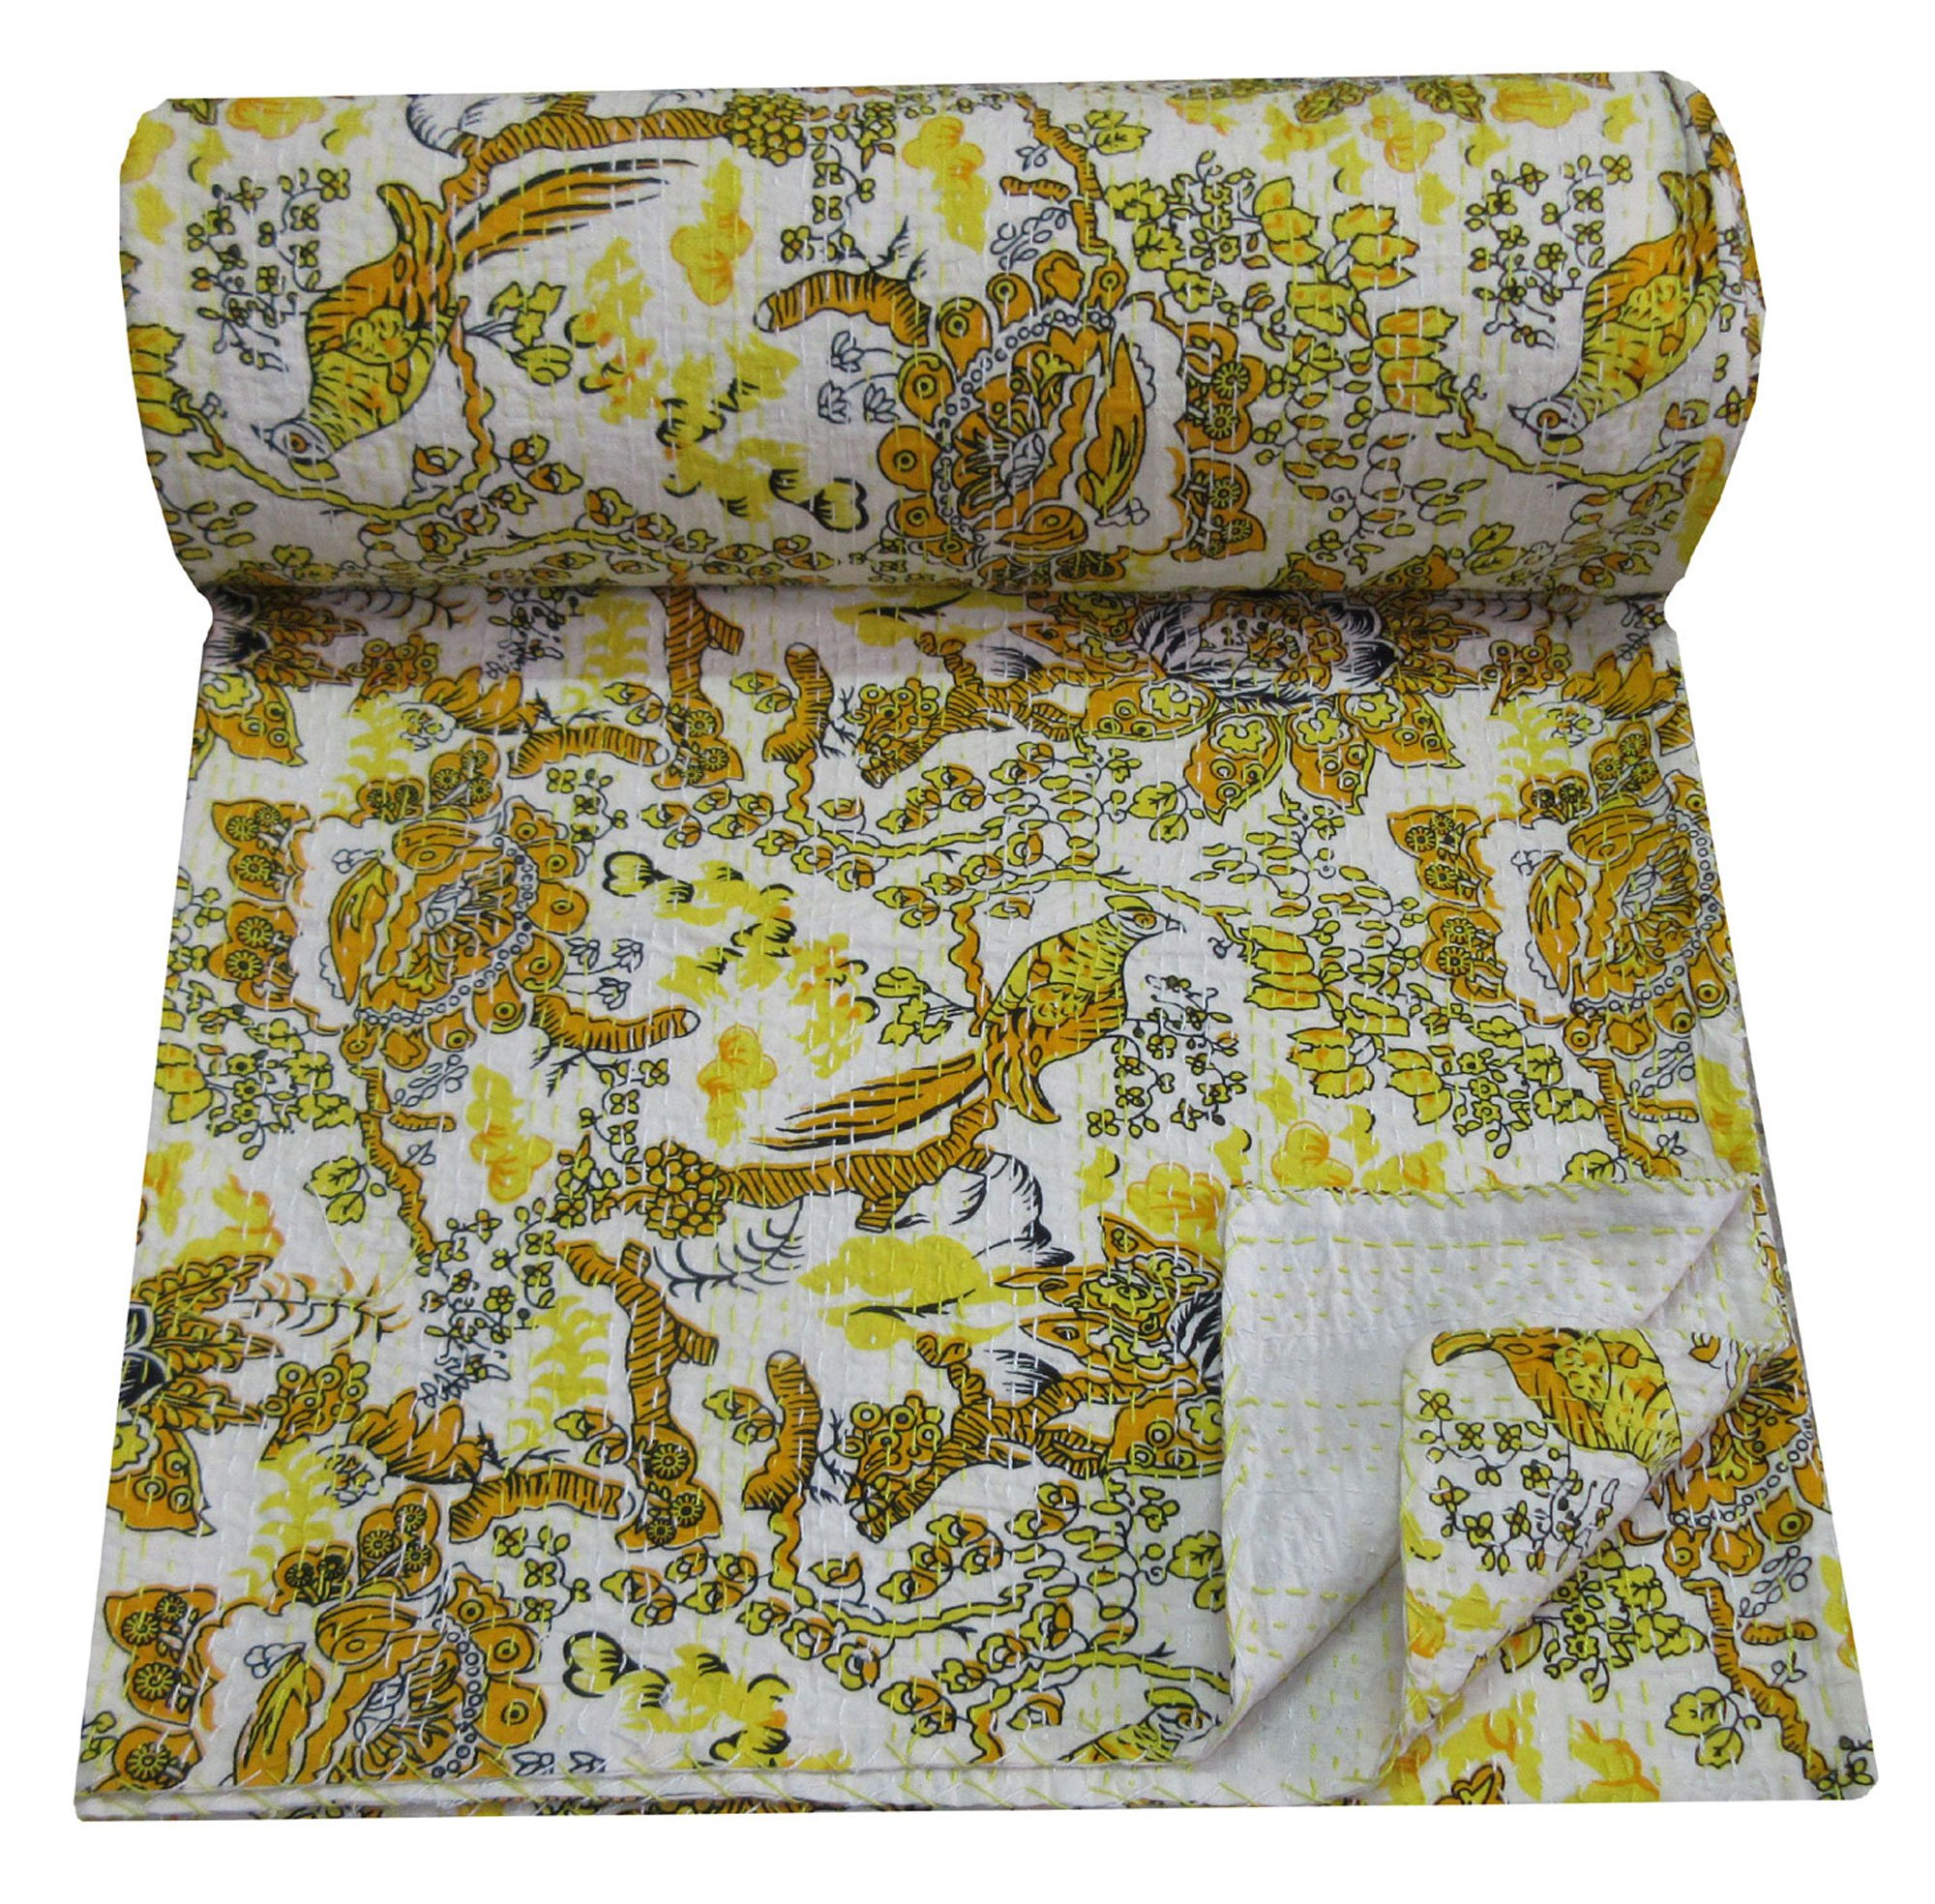 Magic Indians Yellow Handmade Sari Kantha Quilt Floral Bird Design Kantha Bedspread Indian Cotton Kantha Blanket Colorful Kantha Bed Cover Queen Size Kantha Beach Throw Picnic Throw Kantha Wall Decor